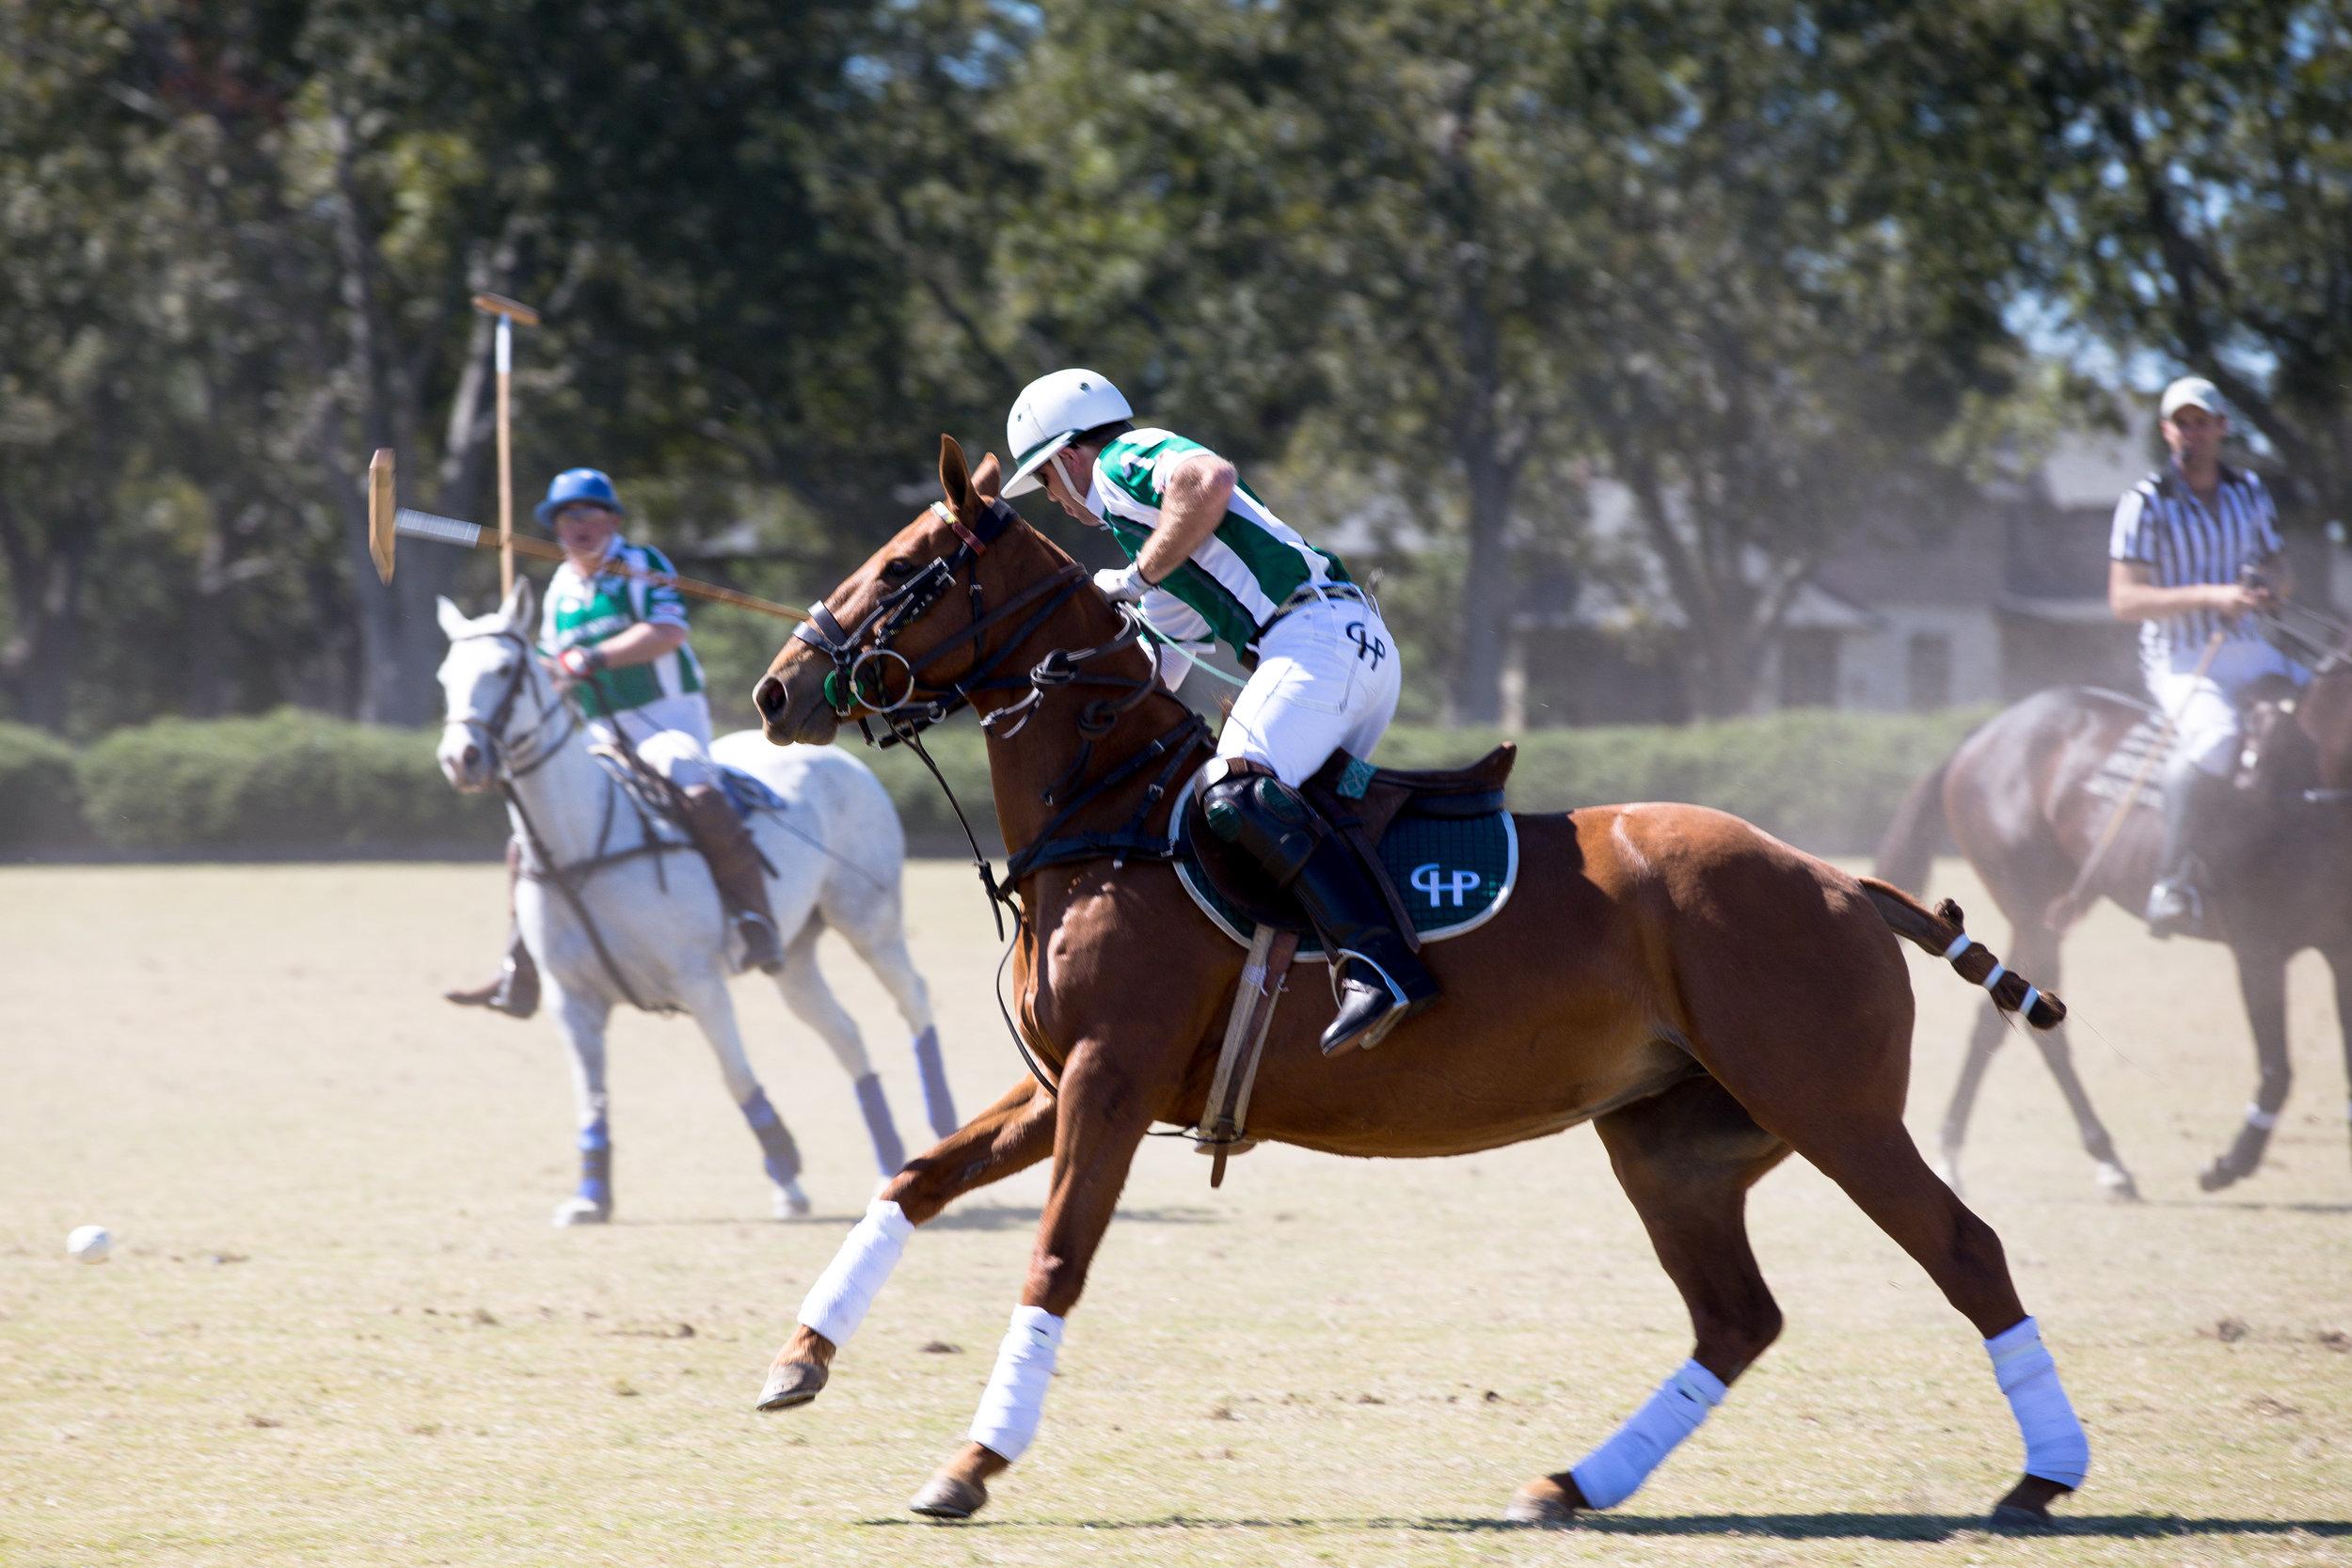 fashion blogger lcb style horse polo fall fashion (5 of 7).jpg